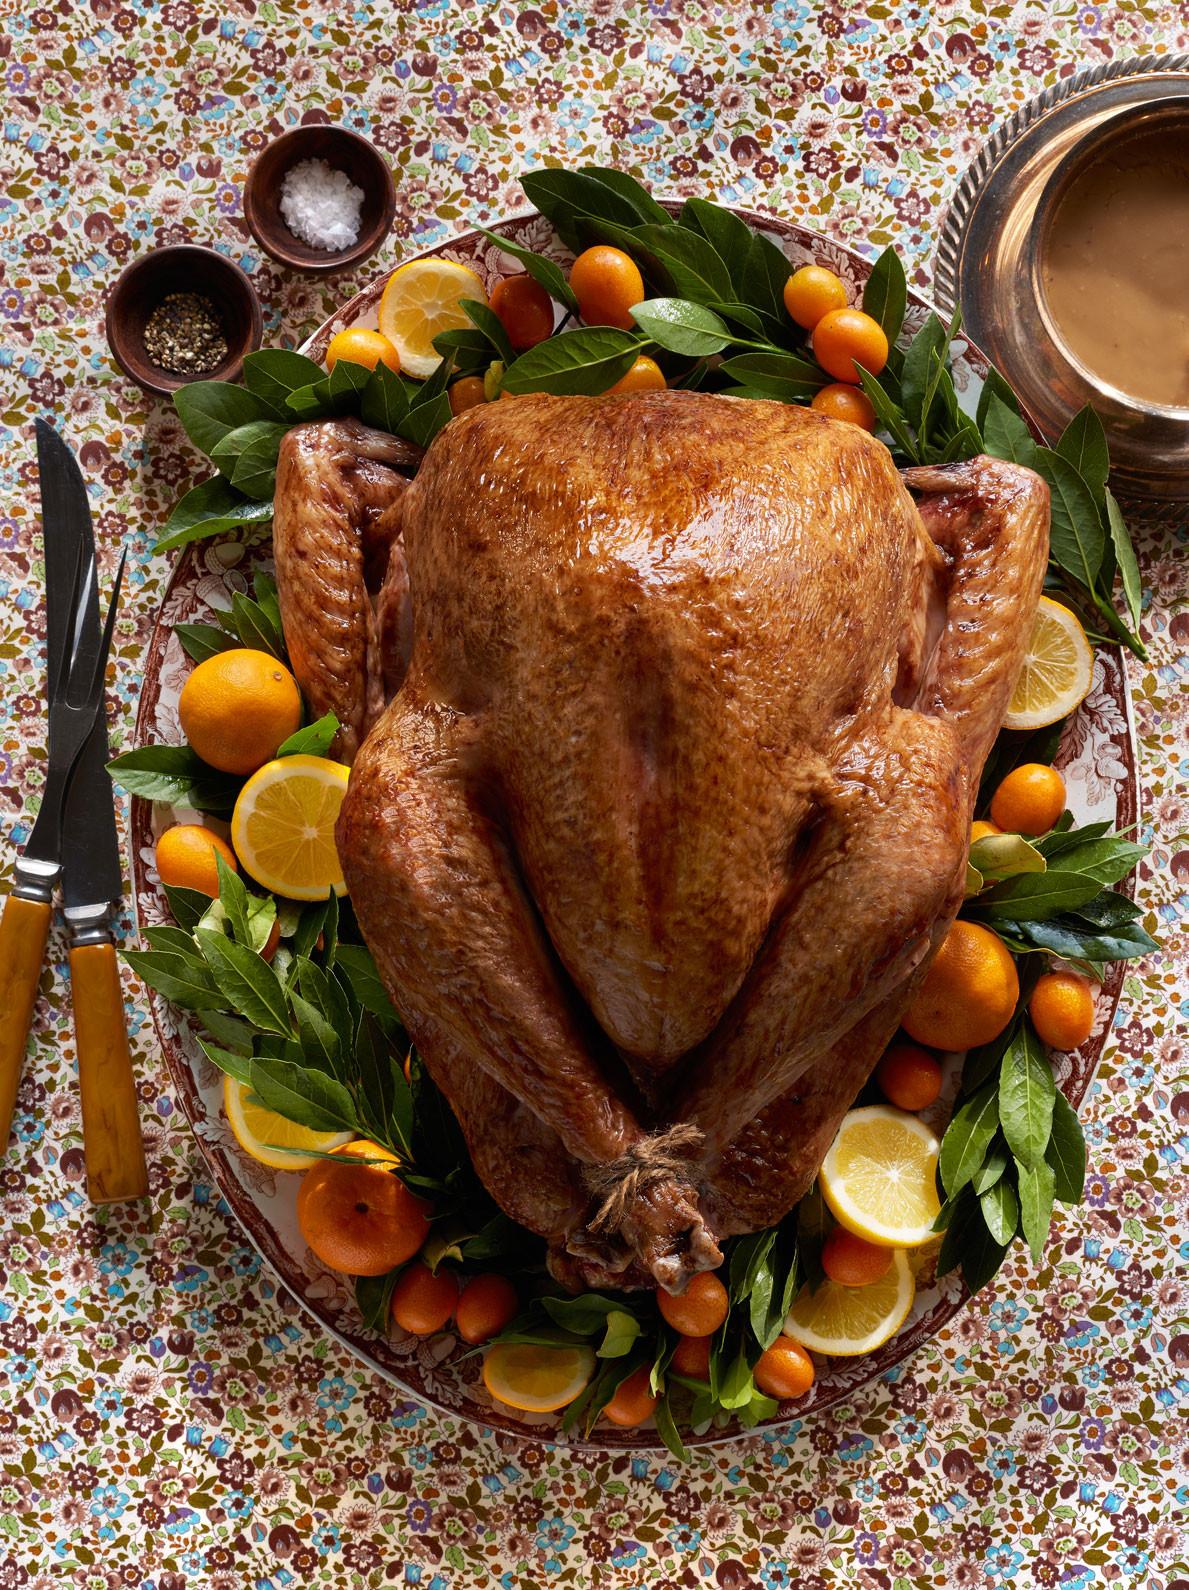 Recipes For Thanksgiving Turkey  25 Best Thanksgiving Turkey Recipes How To Cook Turkey